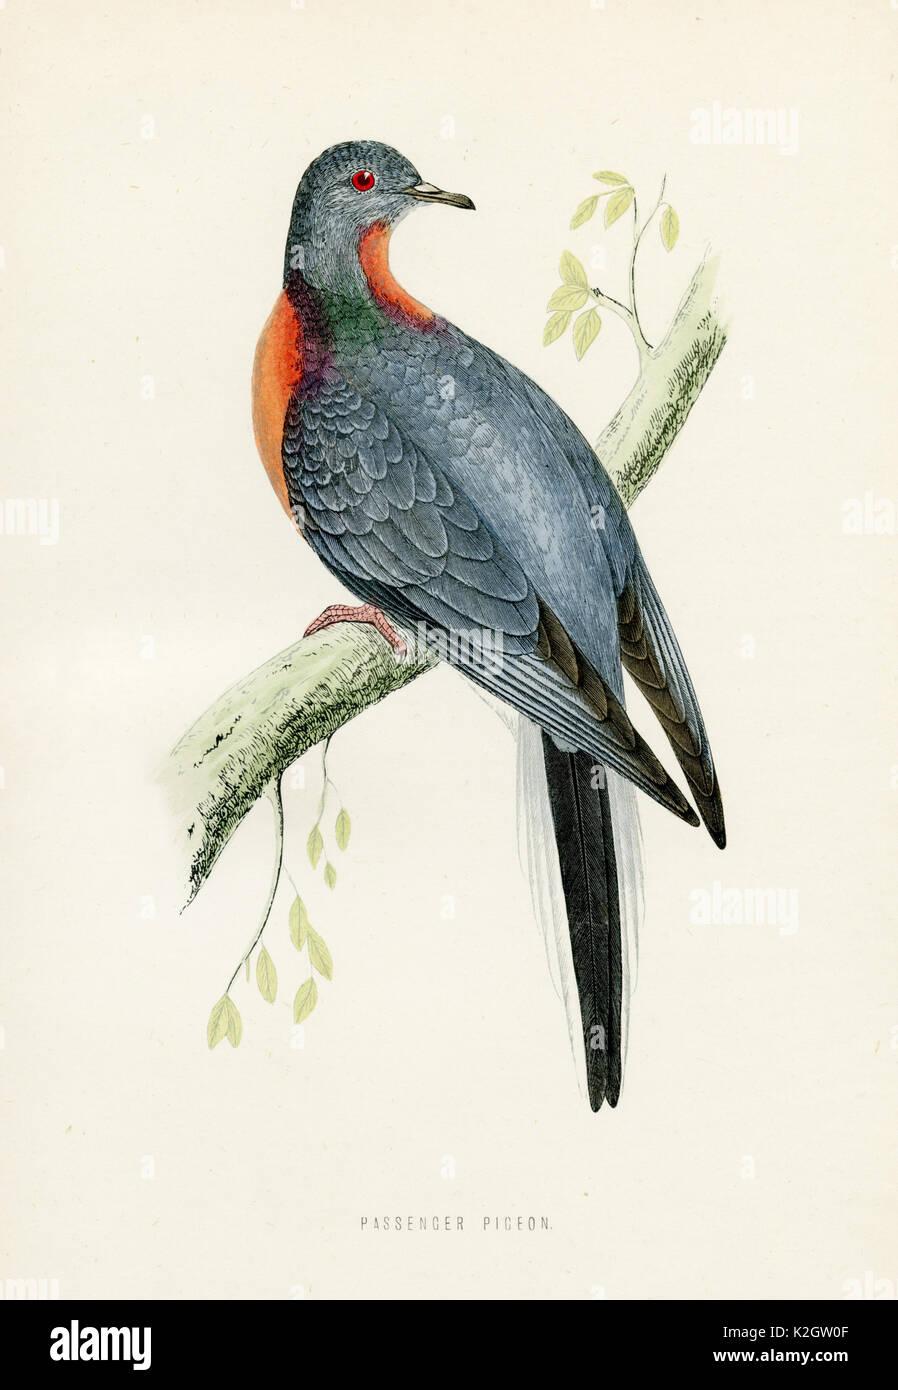 Wandertaube - Ectopistes migratorius - Stock Image